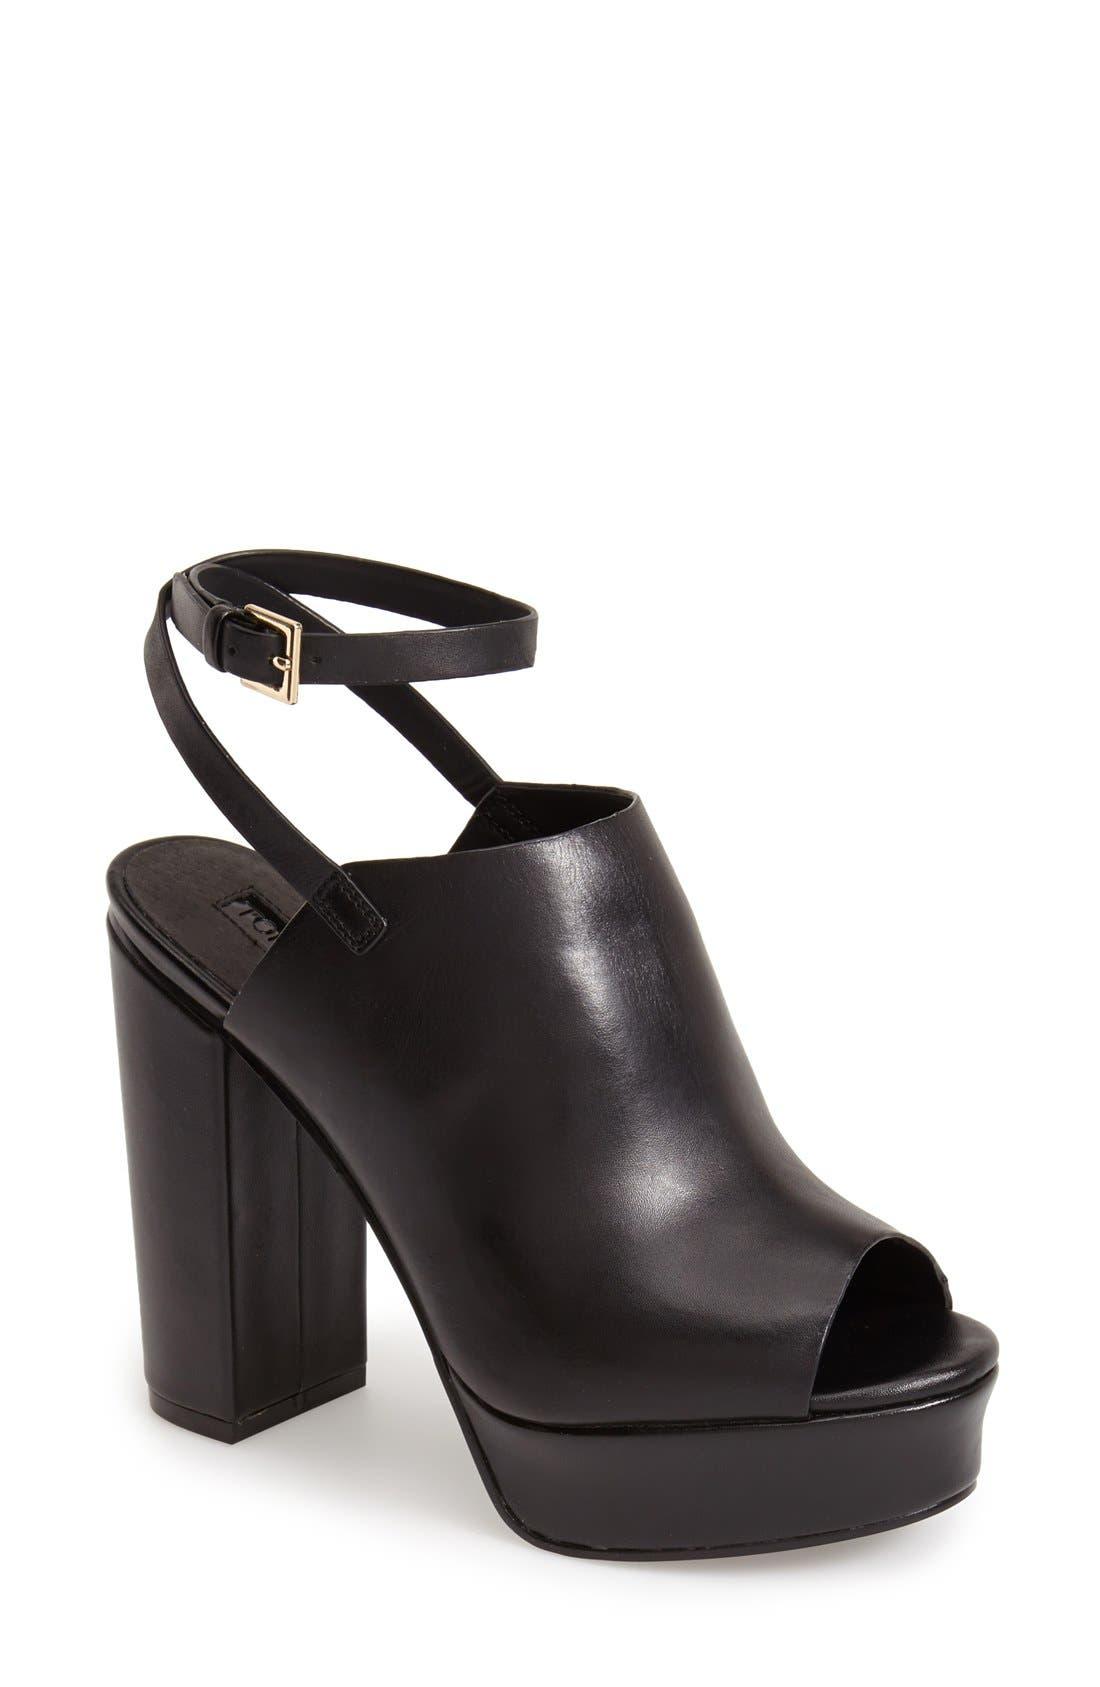 Main Image - Topshop 'Sagittarius' Leather Ankle Strap Open Toe Platform Sandal (Women)